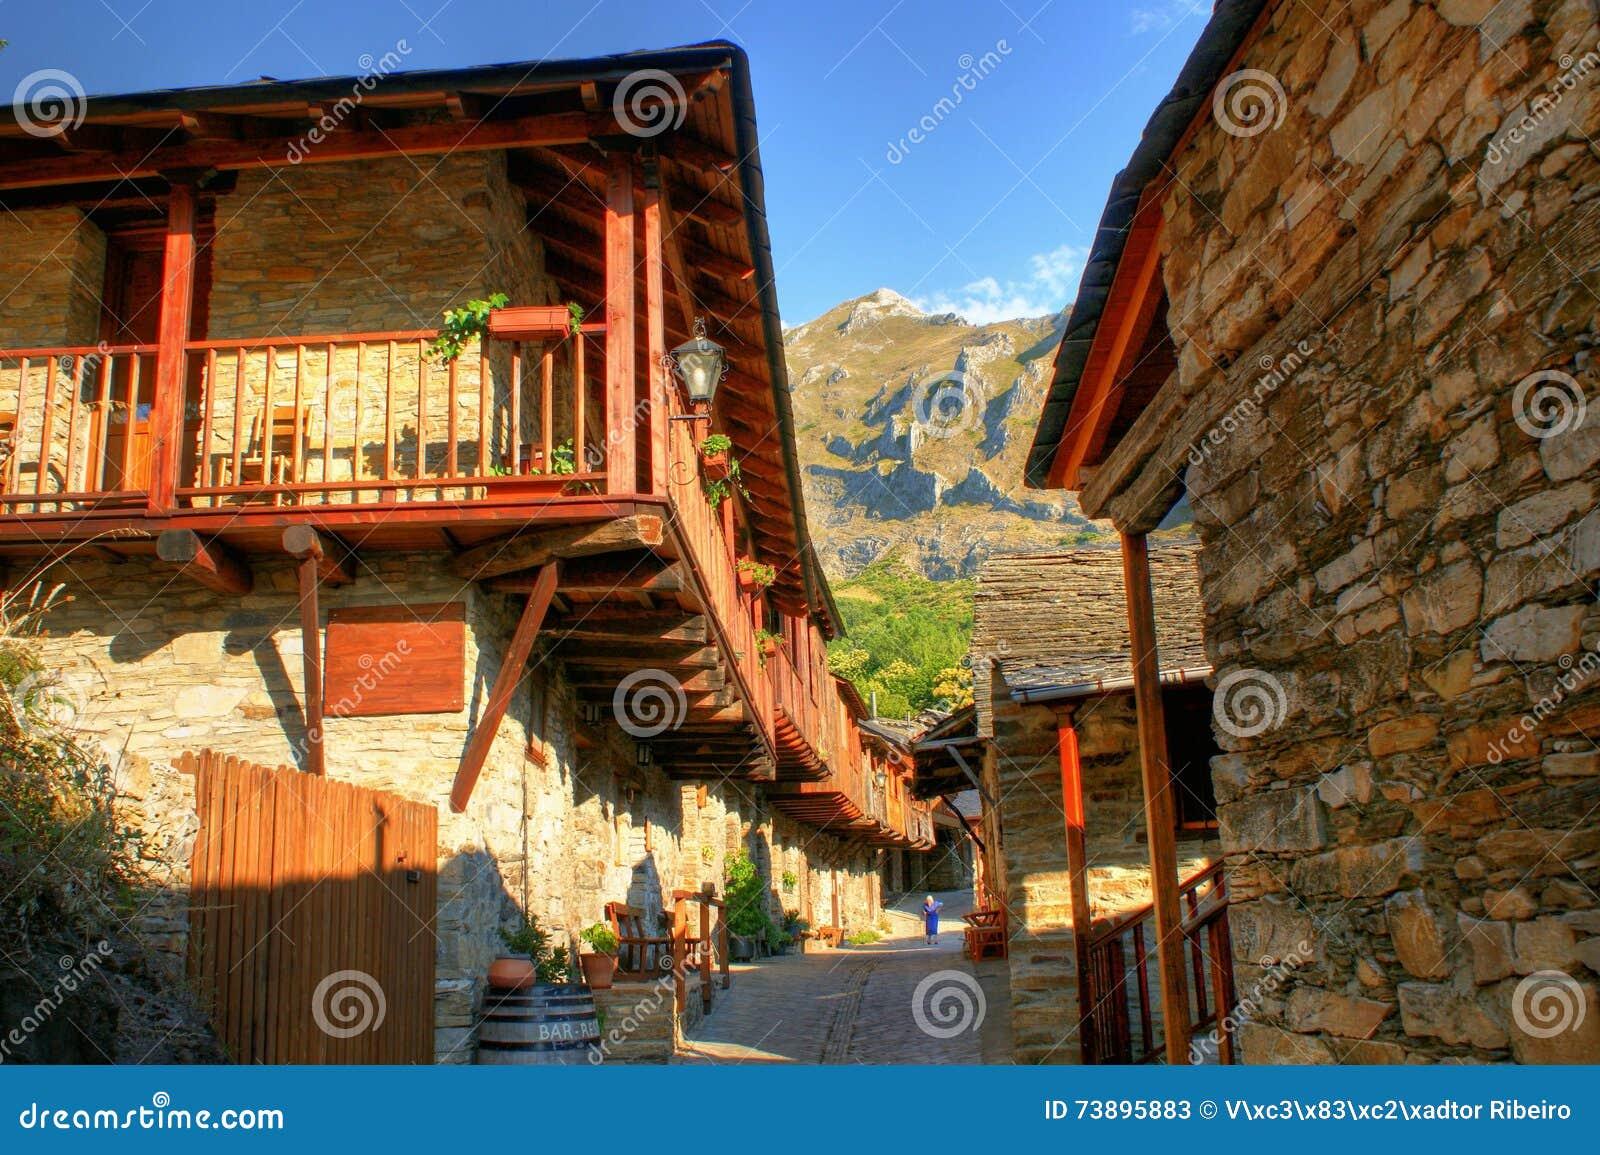 Penalba de Santiago, a typical village in the valley of silence